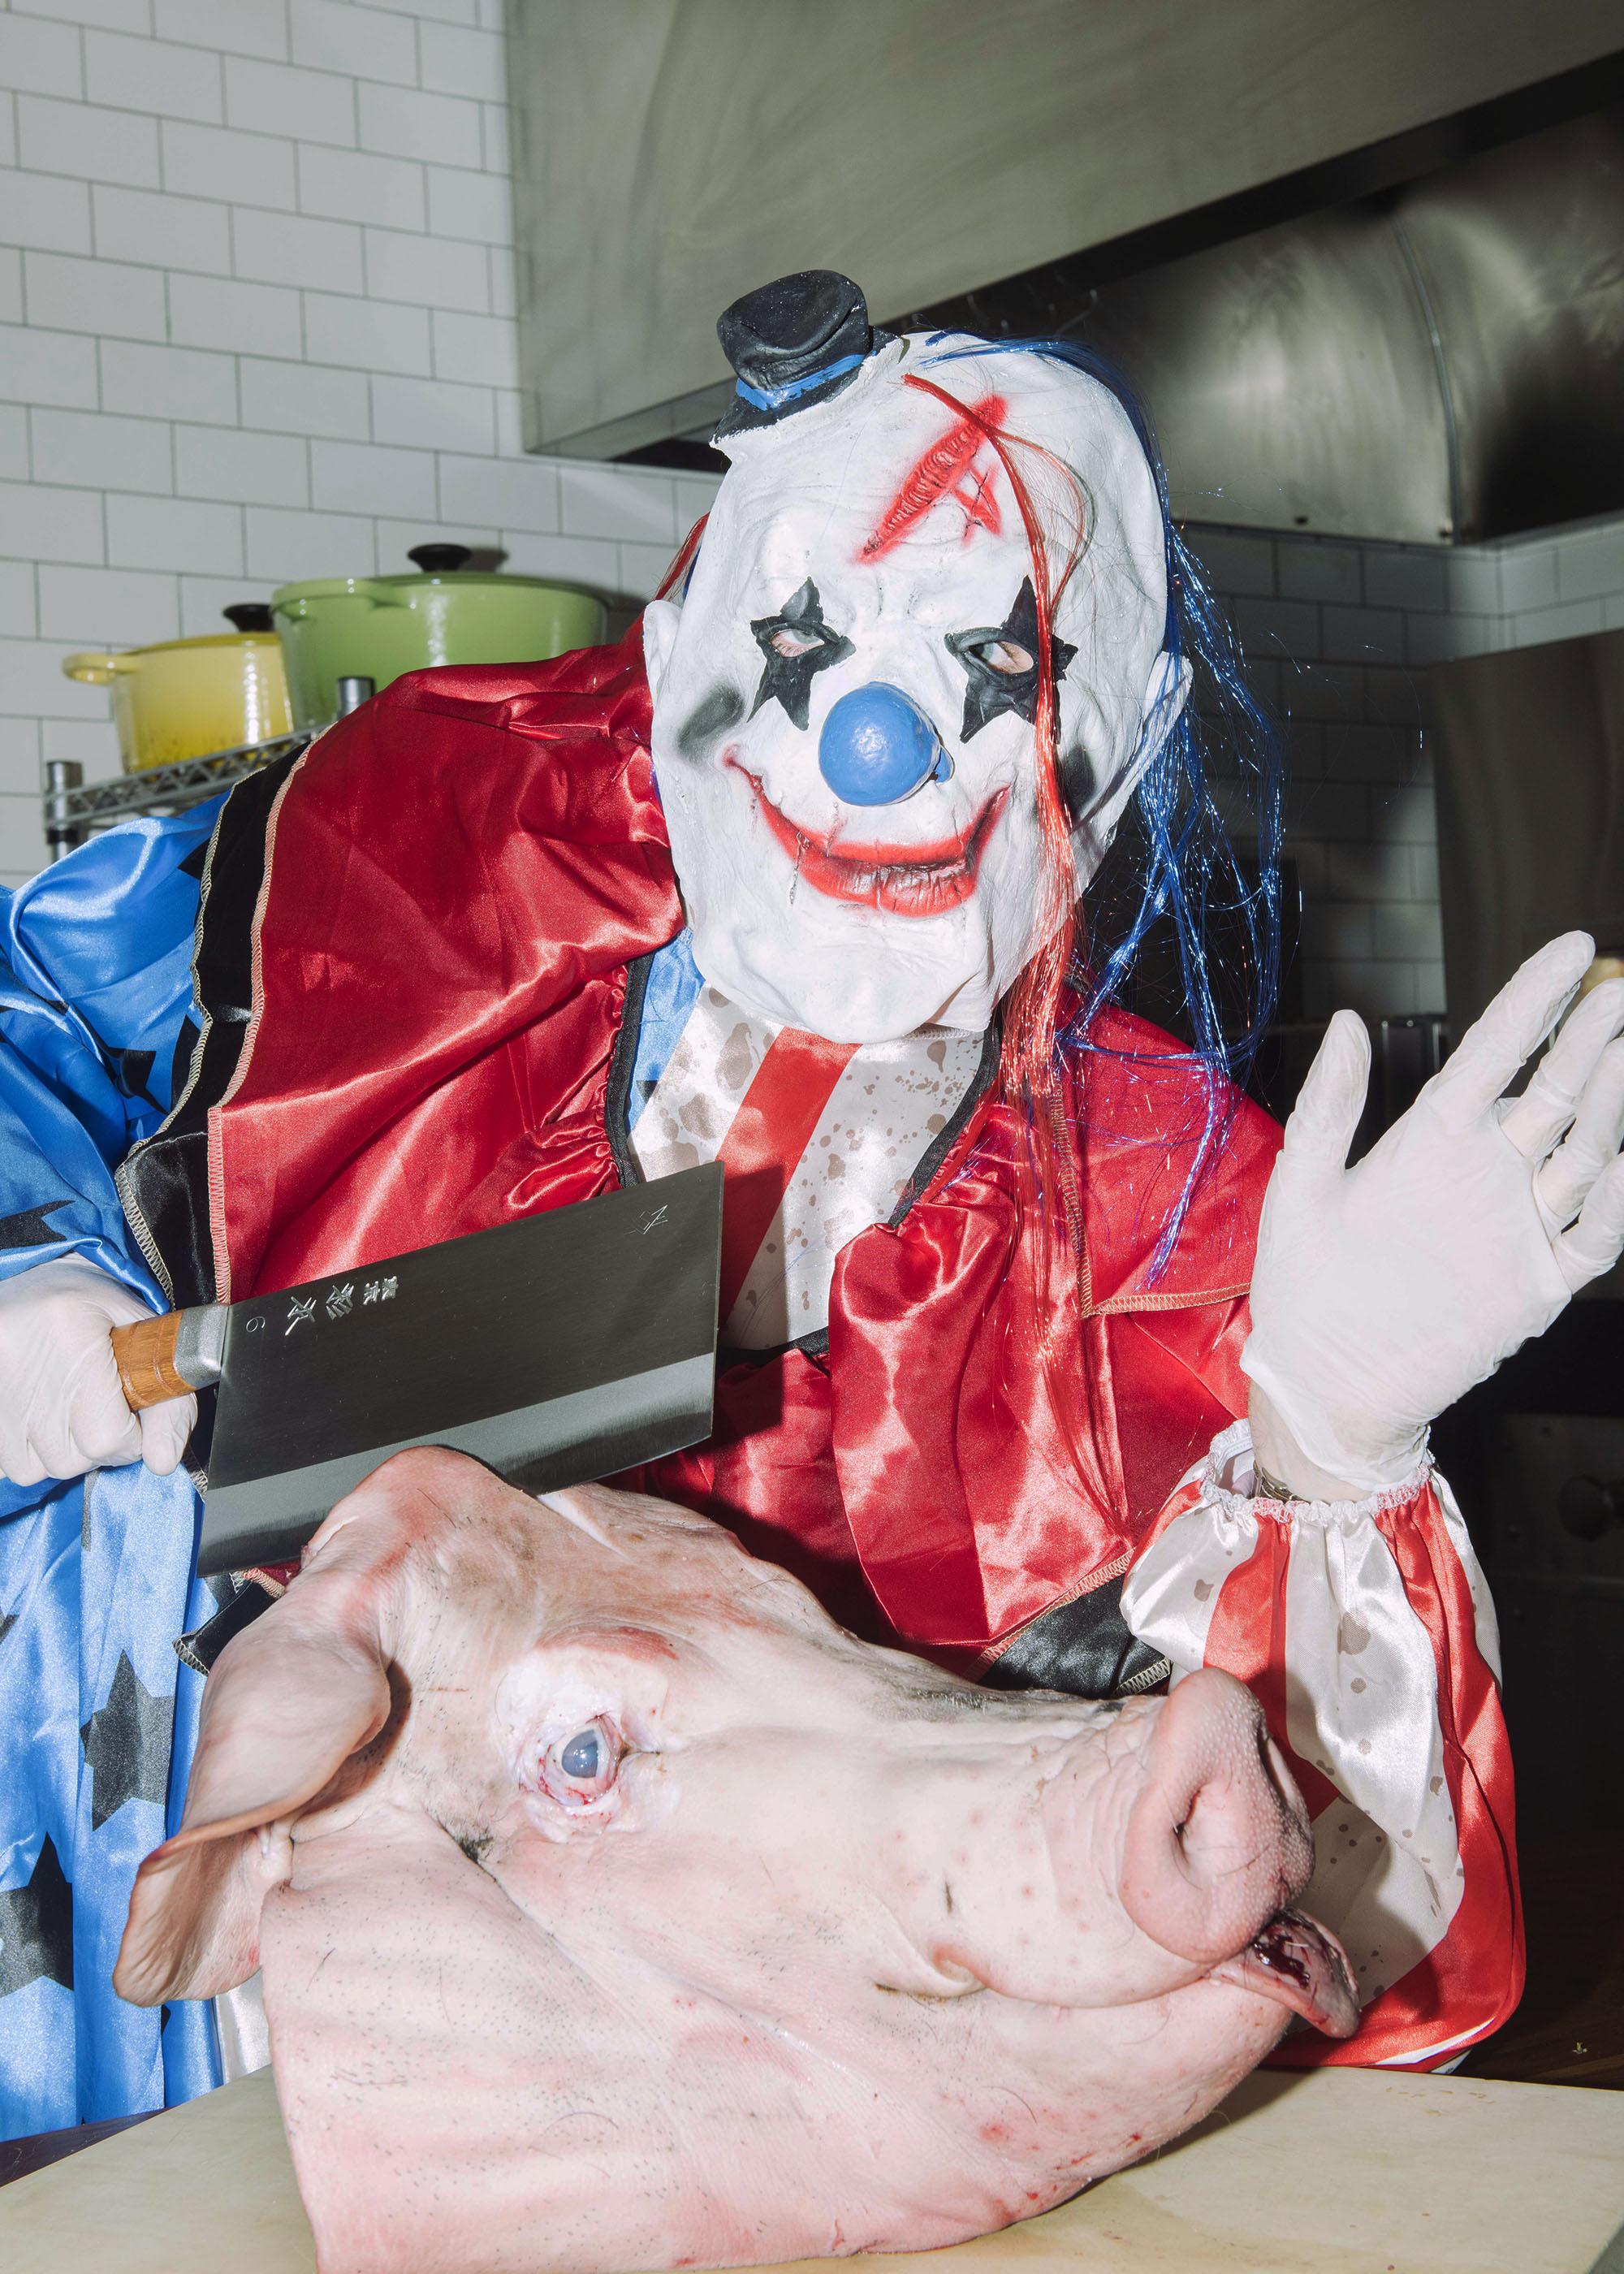 clown-knives-shoot-8